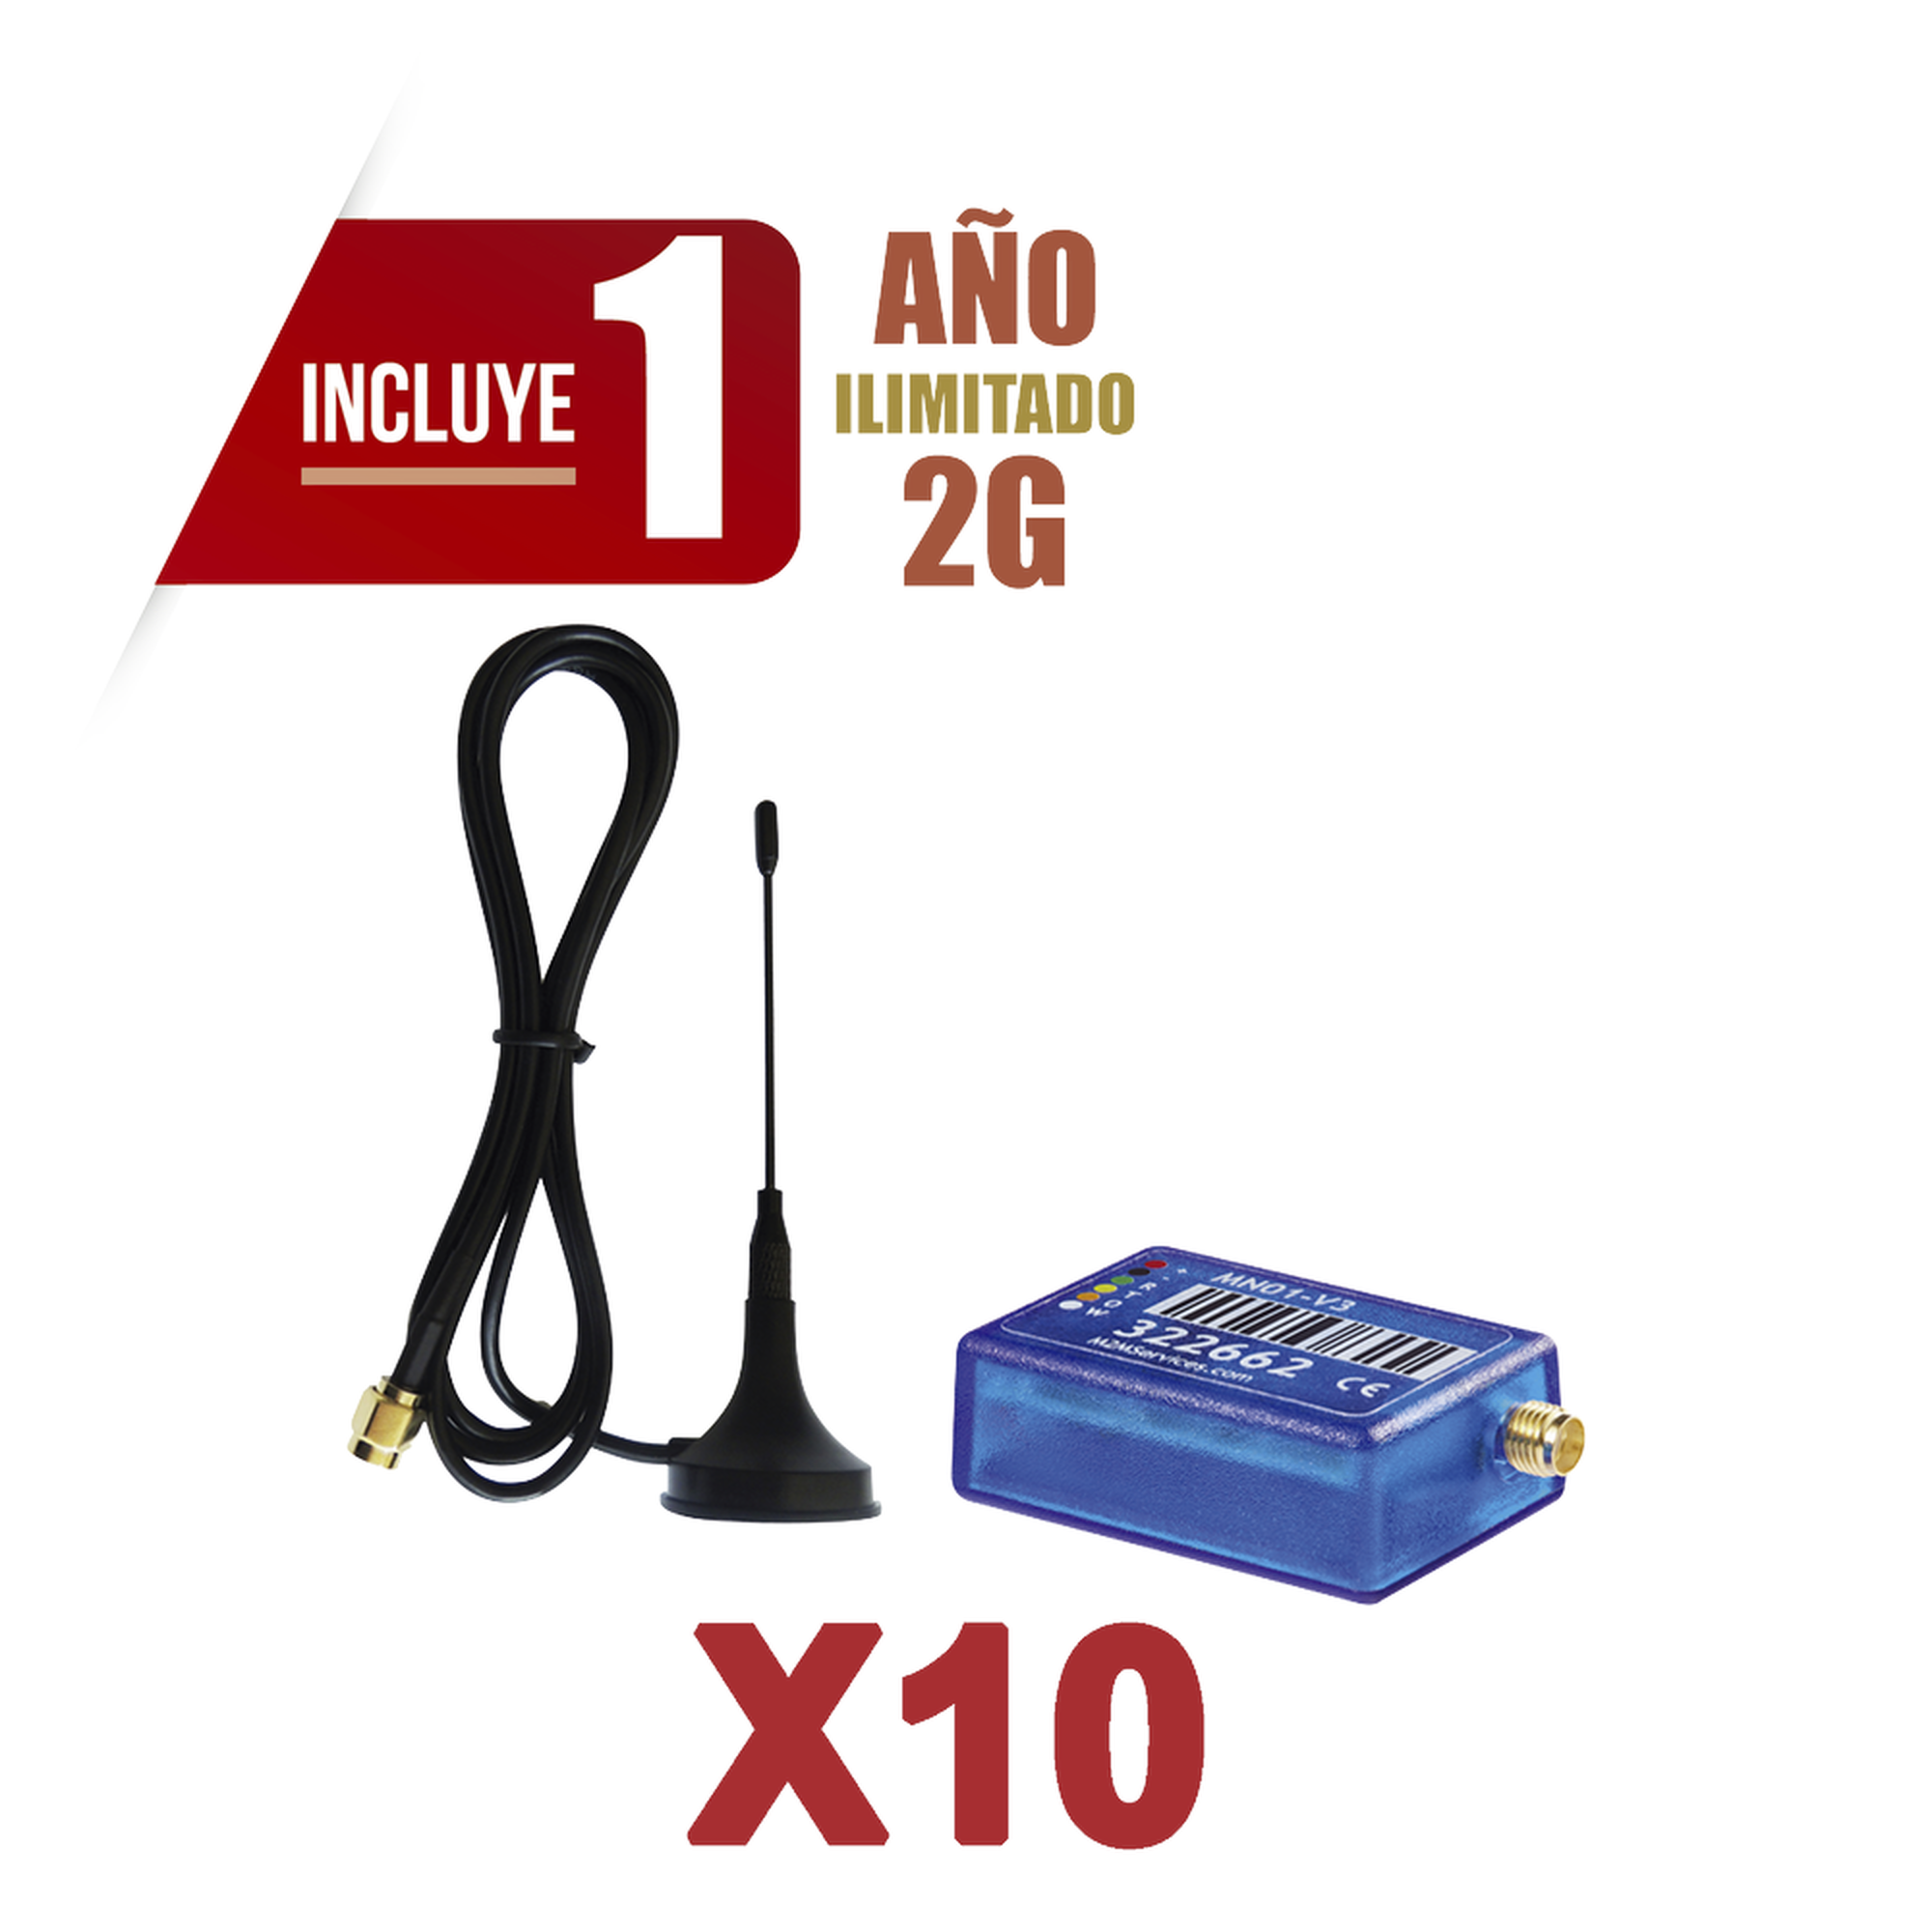 KIt de 10 Comunicadores de Alarma MINI012G con Antena 2G / Incluyen 1 Año de Cobertura / Aplicación Gratuita / Cero Configuración / Compatible Honeywell/DSC/CROW/PIMA